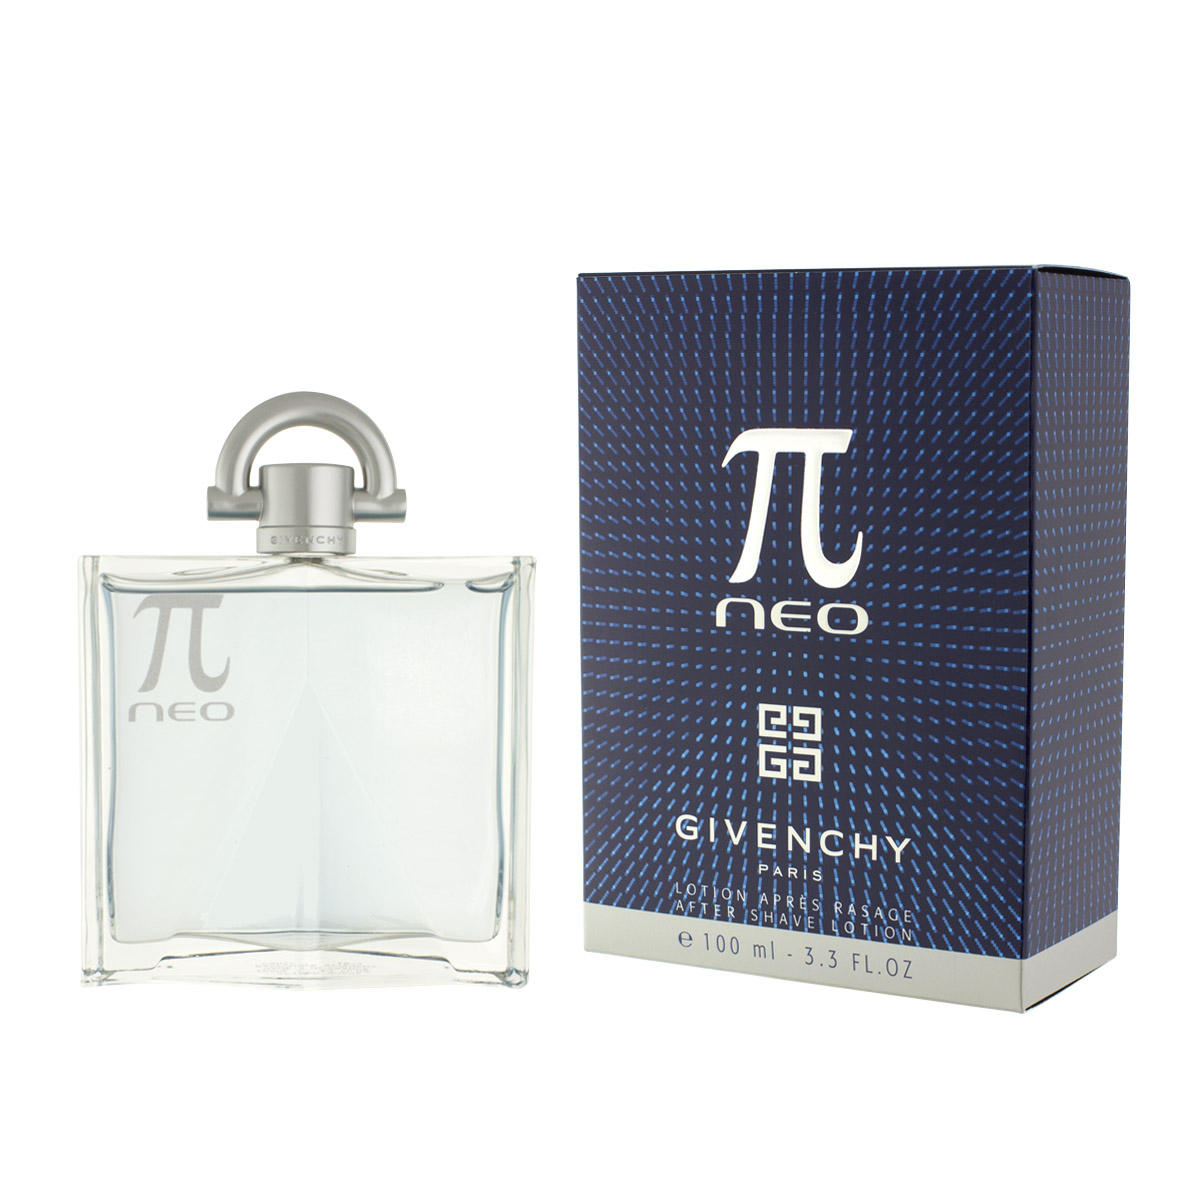 Givenchy Pi Neo AS 100 ml M